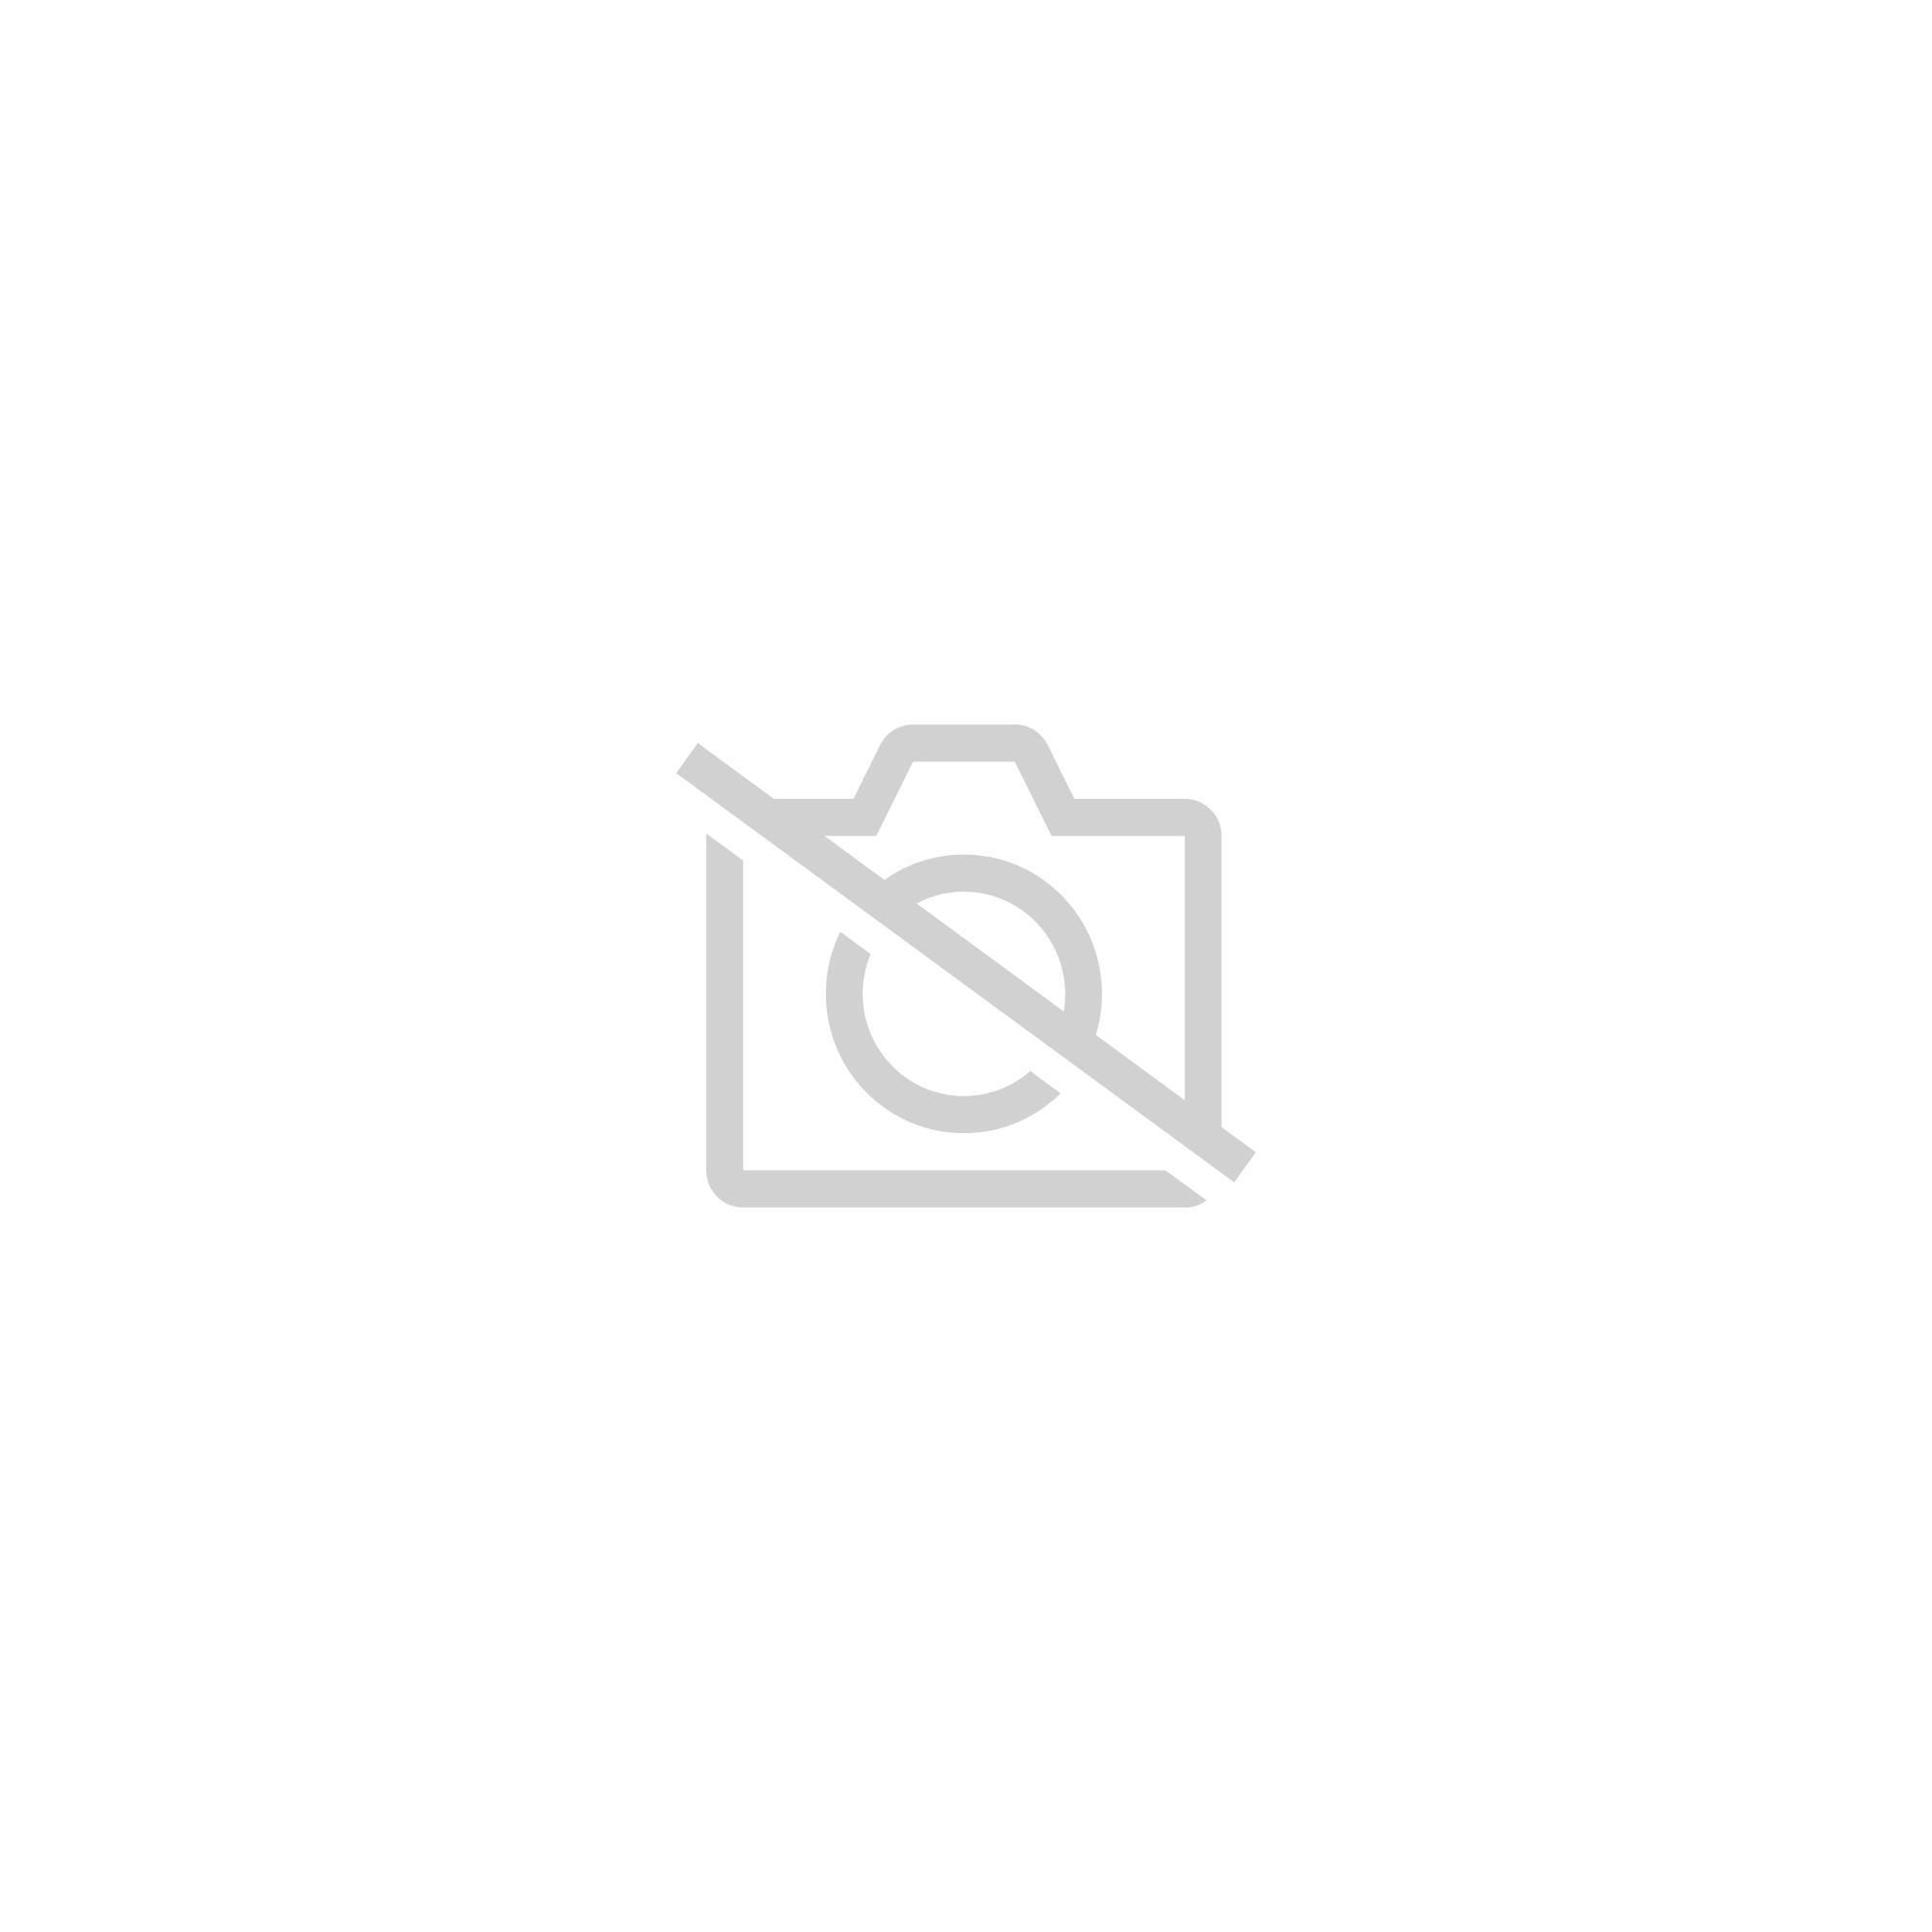 Dr Martens Glany 1460 W 11821104 Femme Botte Blanc